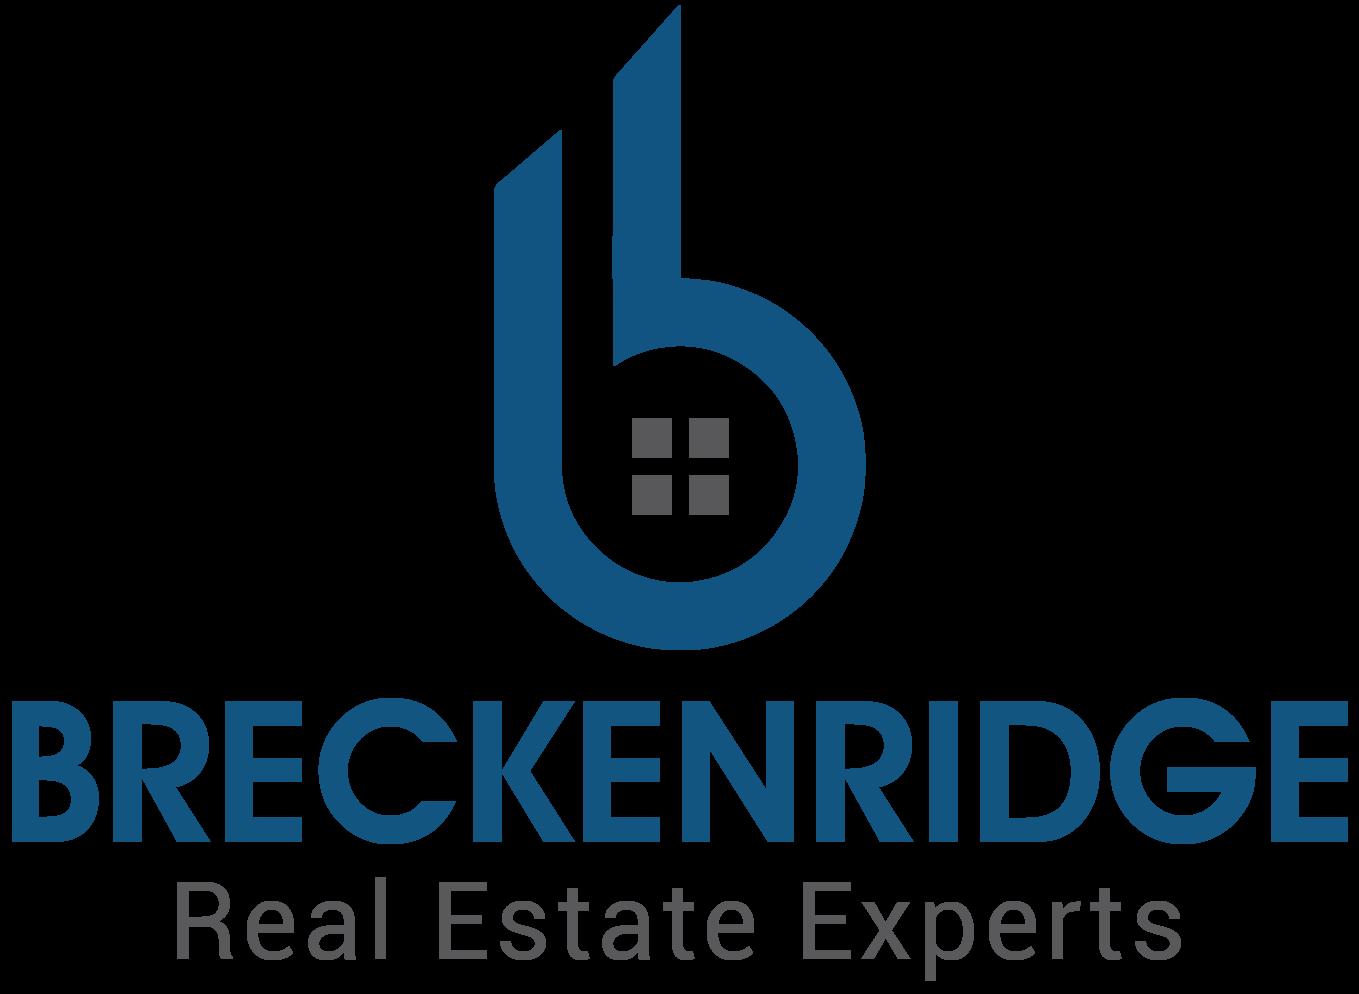 Ben BrewerBreckenridge Real Estate Experts